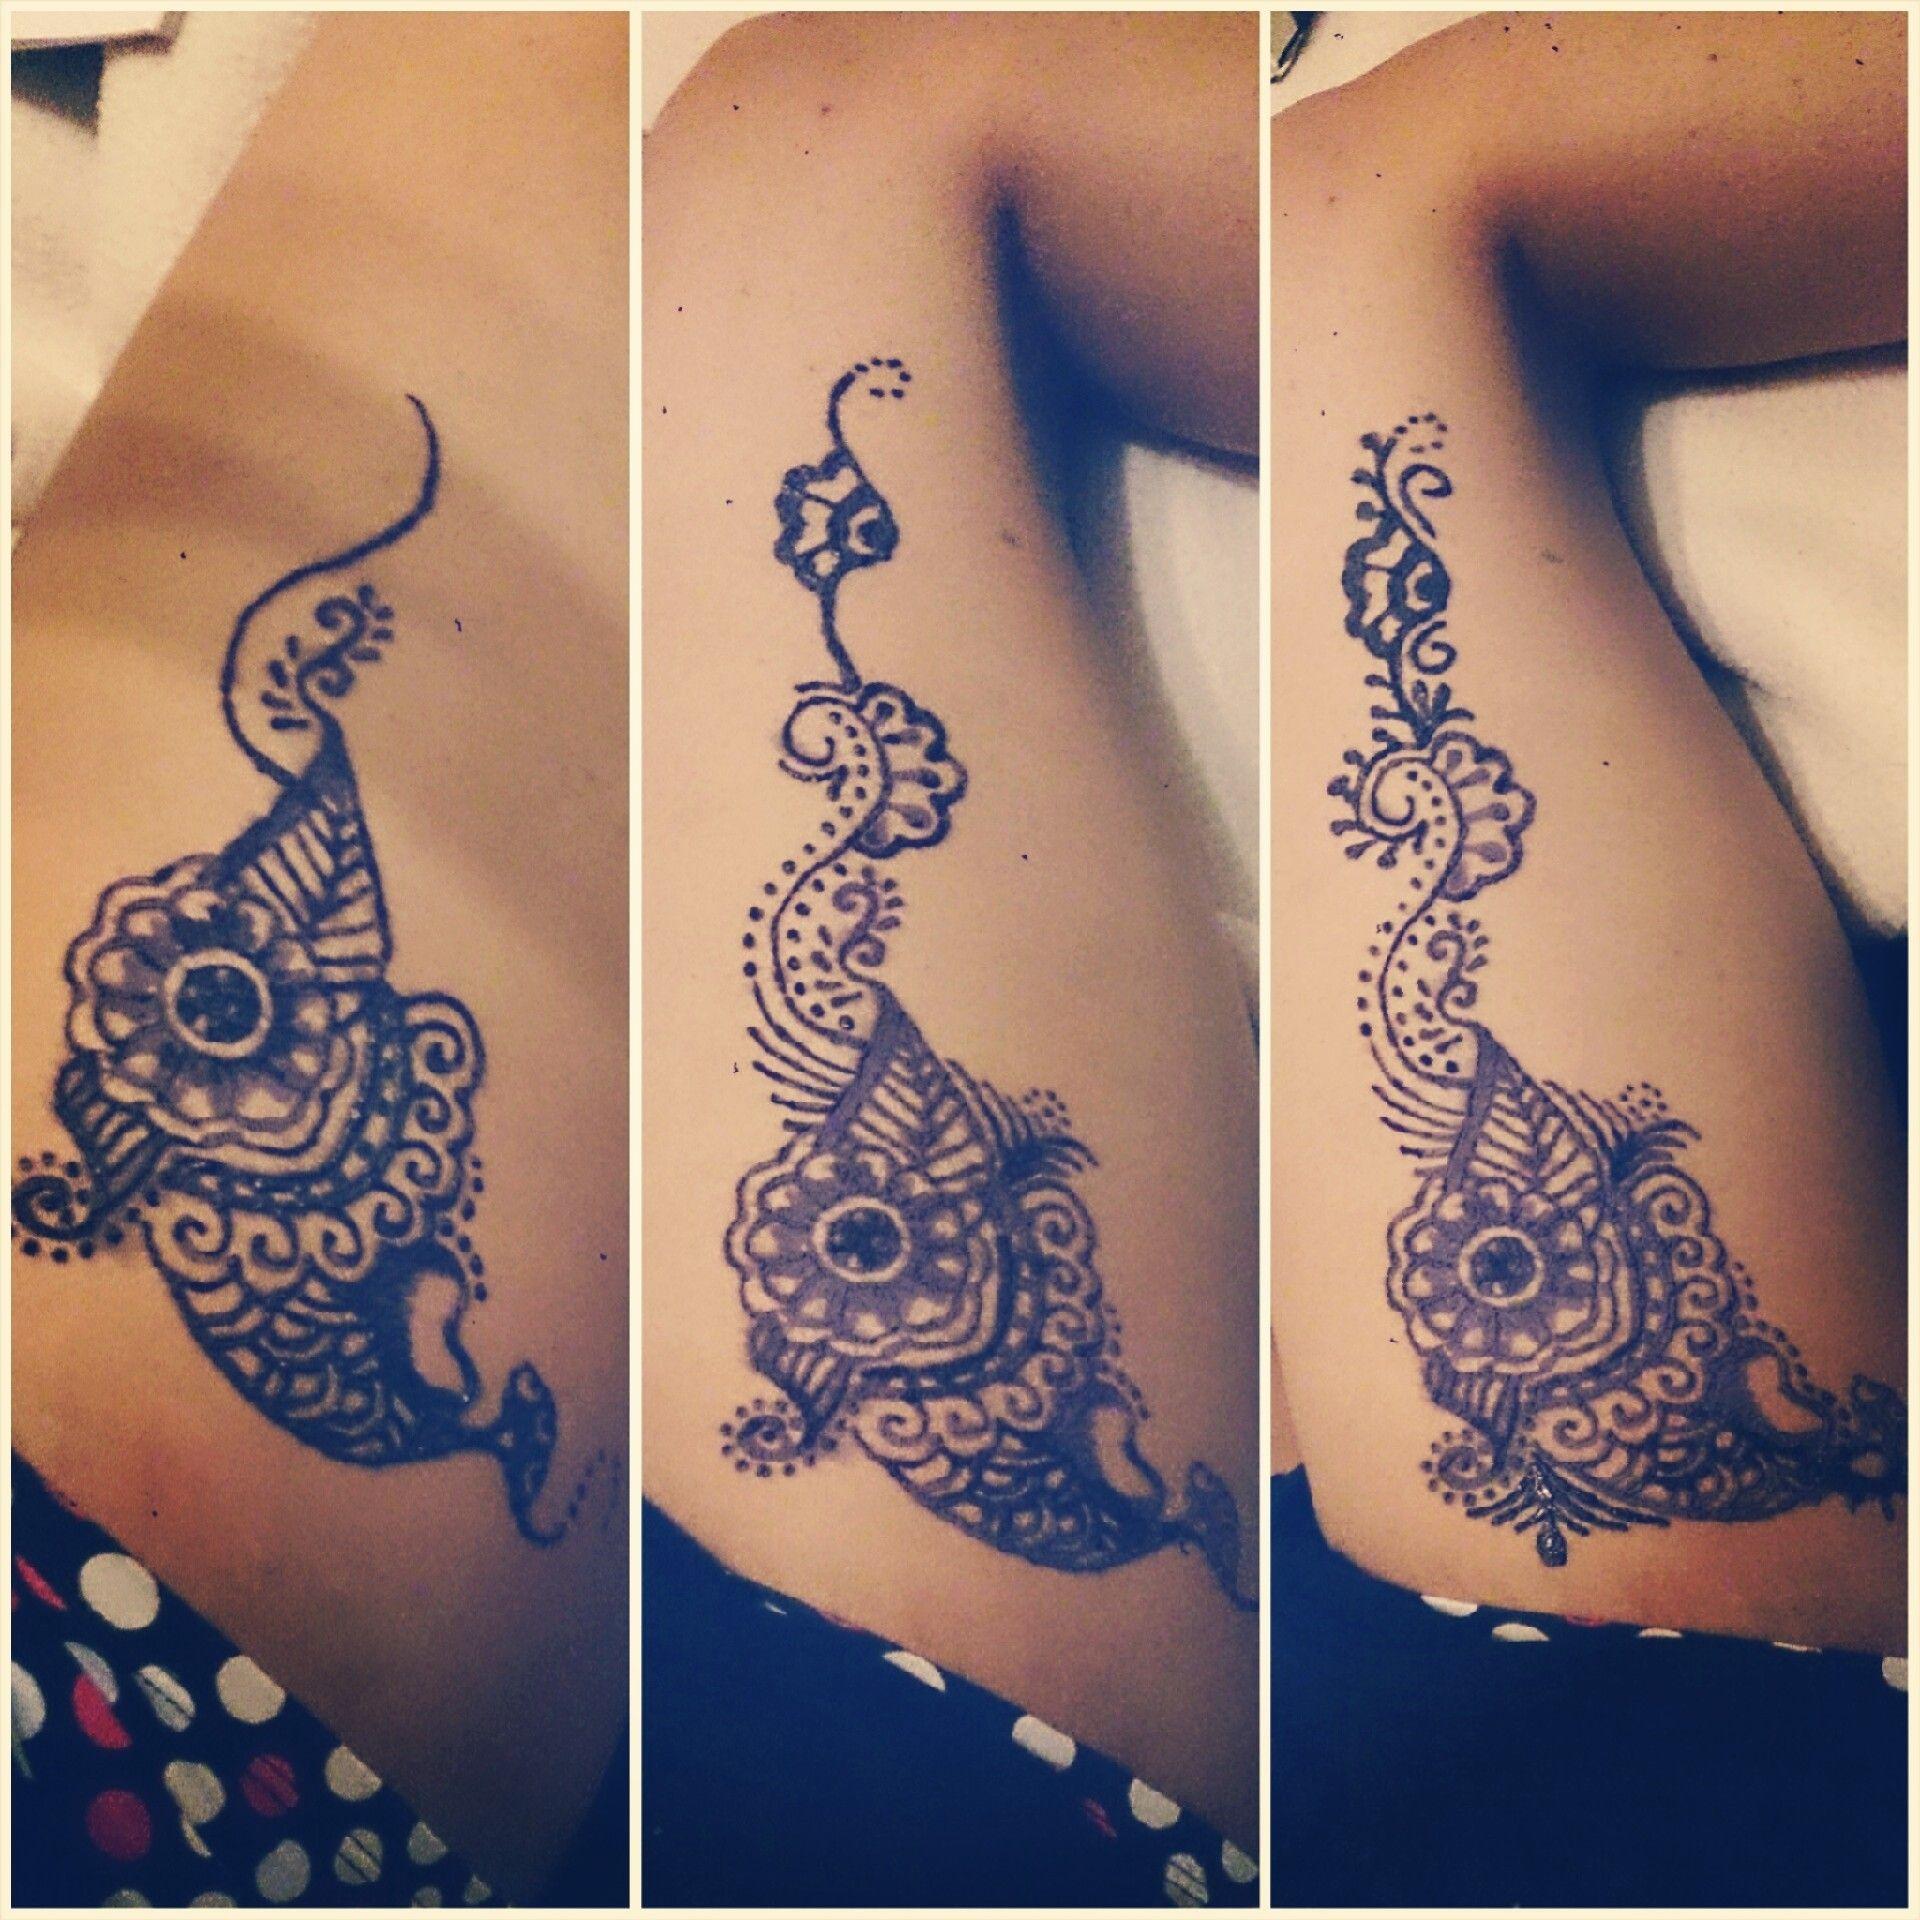 An upper leg thigh tattoo hand tattoos tattoos hand